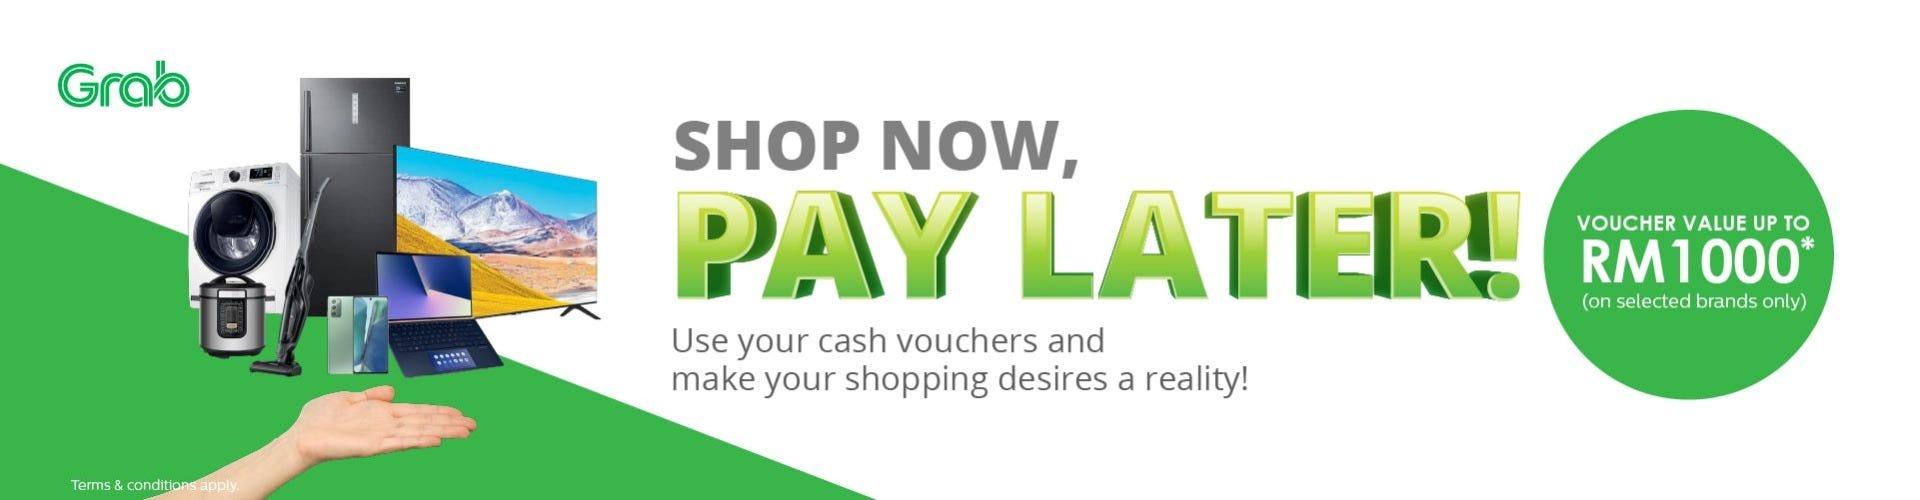 Grab Pay